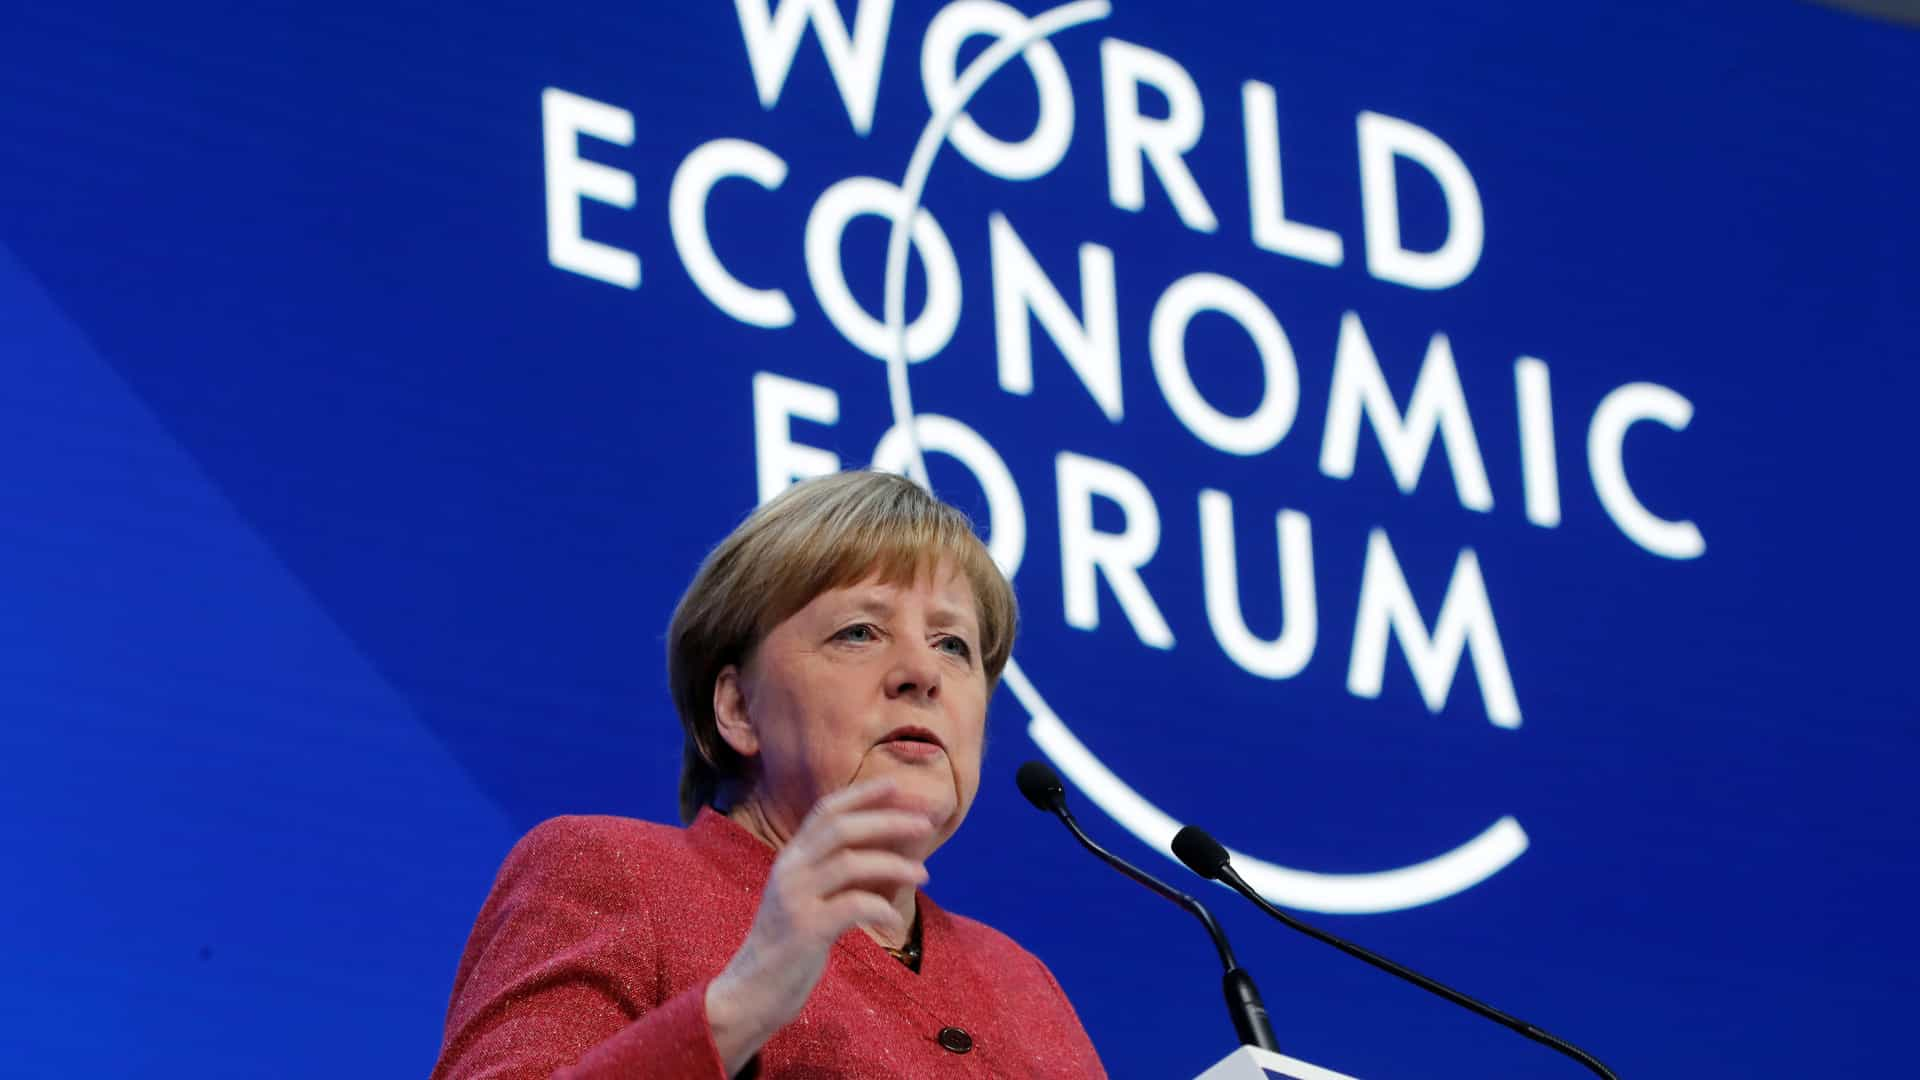 Merkel reitera defesa do multilateralismo e compromissos a nível global